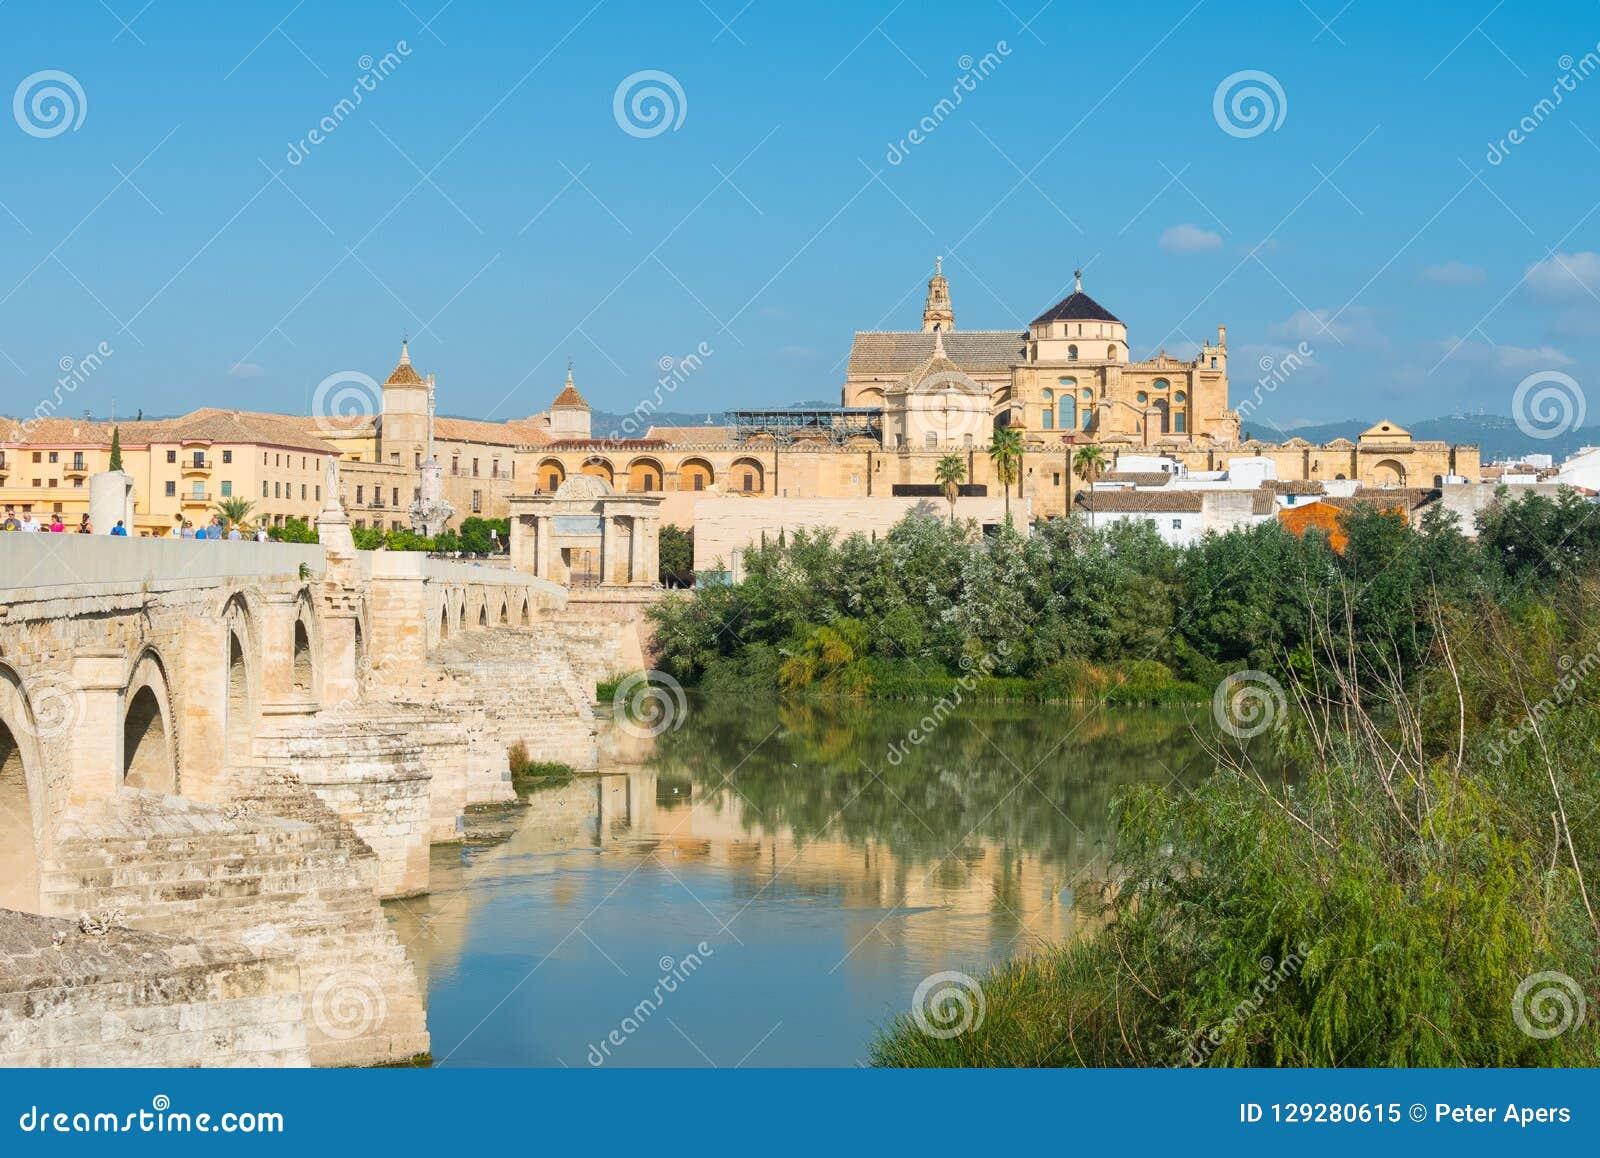 Mezquita and Roman bridge in Cordoba